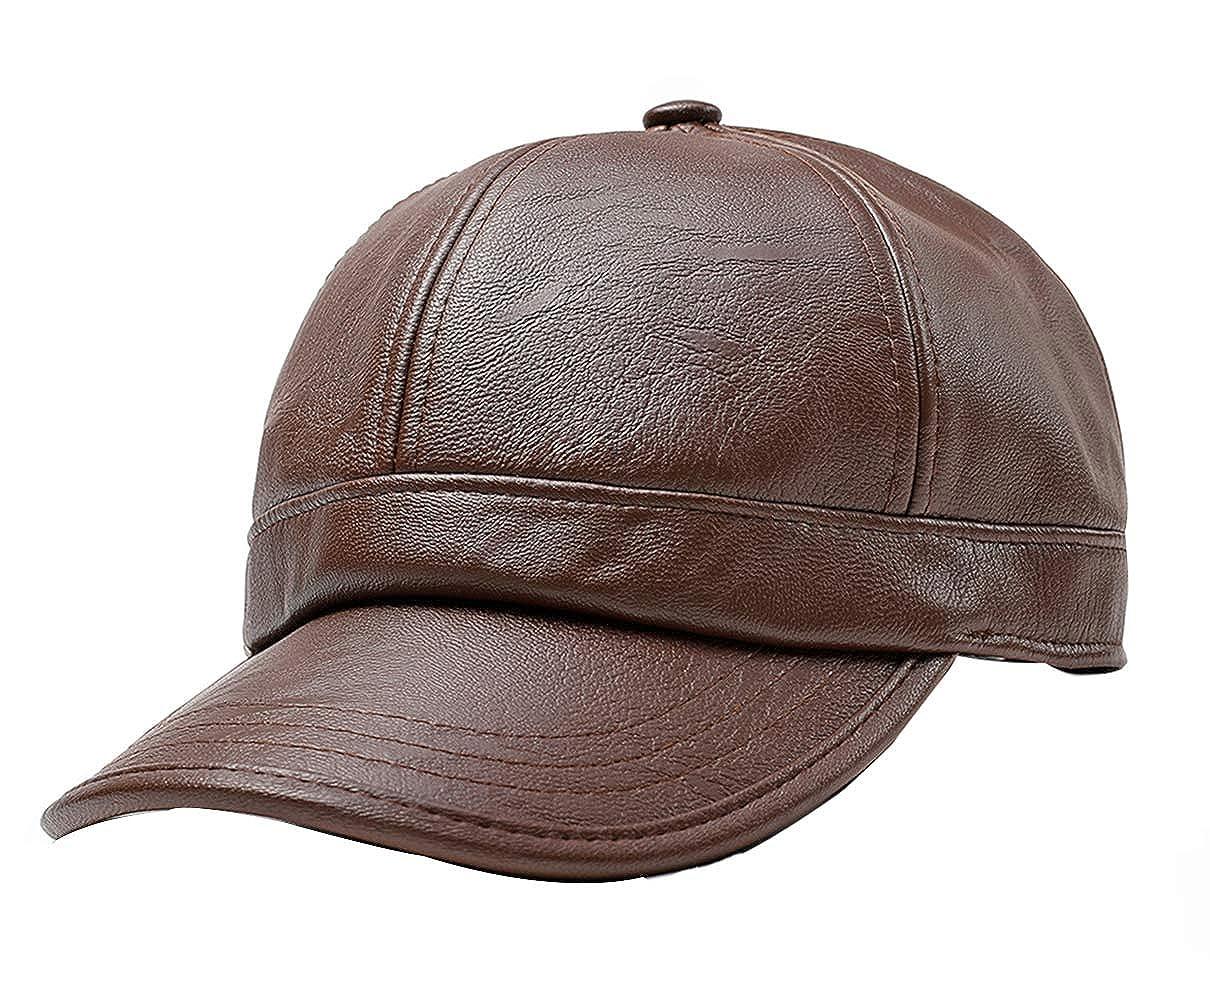 be254996e661ac FENGFA Baseballmütze PU Leder Cap Herren Herbst und Winter Kappe mit  Ohrenklappen(56-60 cm) (Braun): Amazon.de: Bekleidung